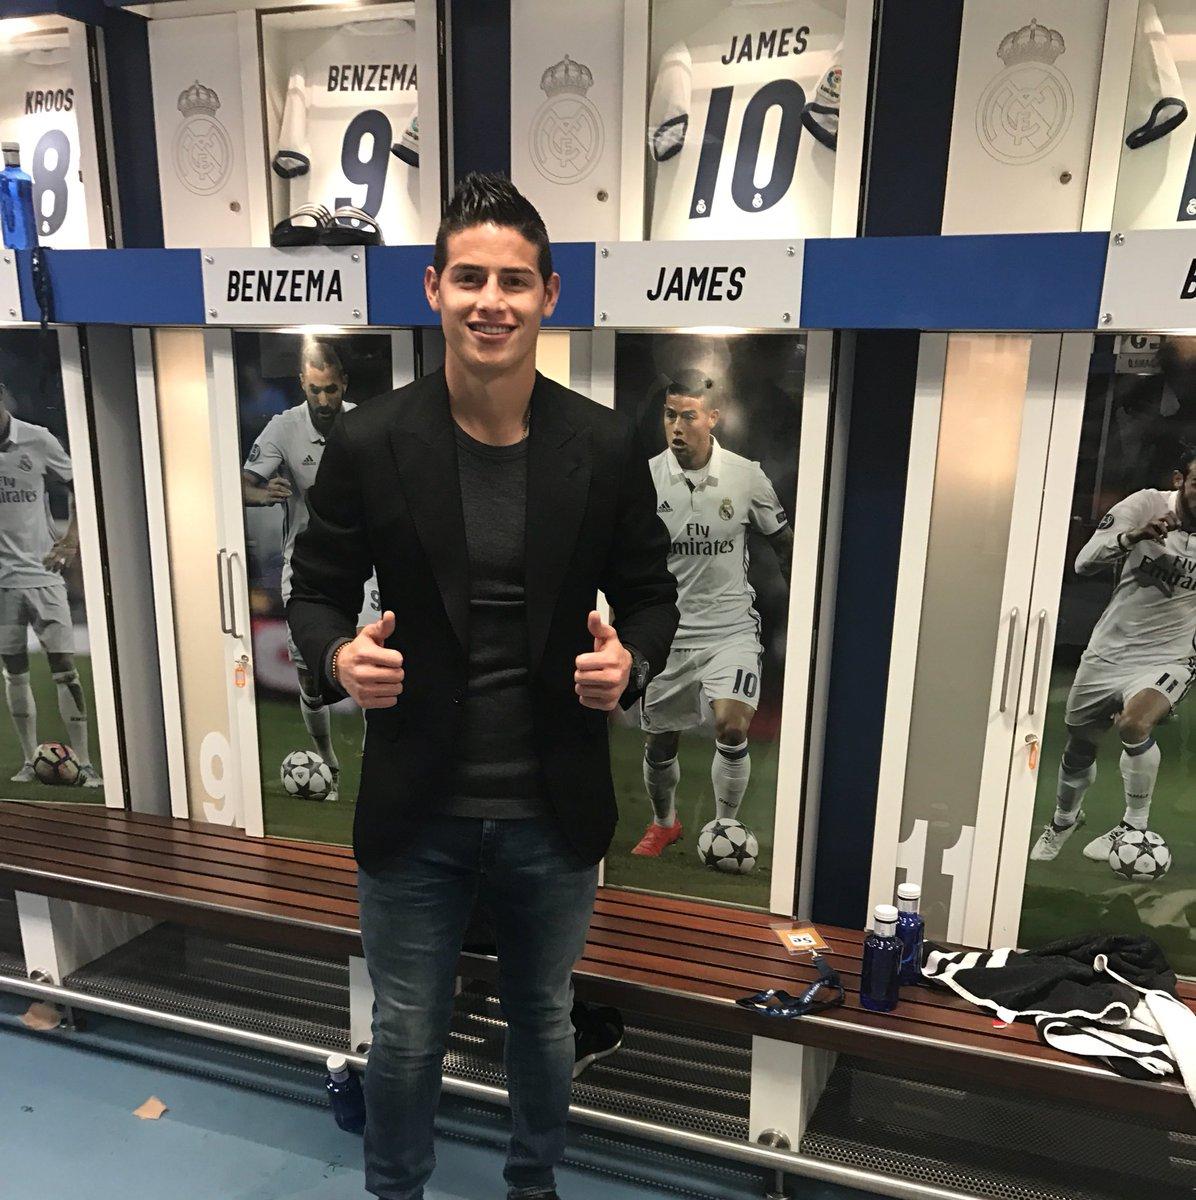 James Rodriguez On Twitter Gran Trabajo El Dia De Hoy En Champions Halamadrid